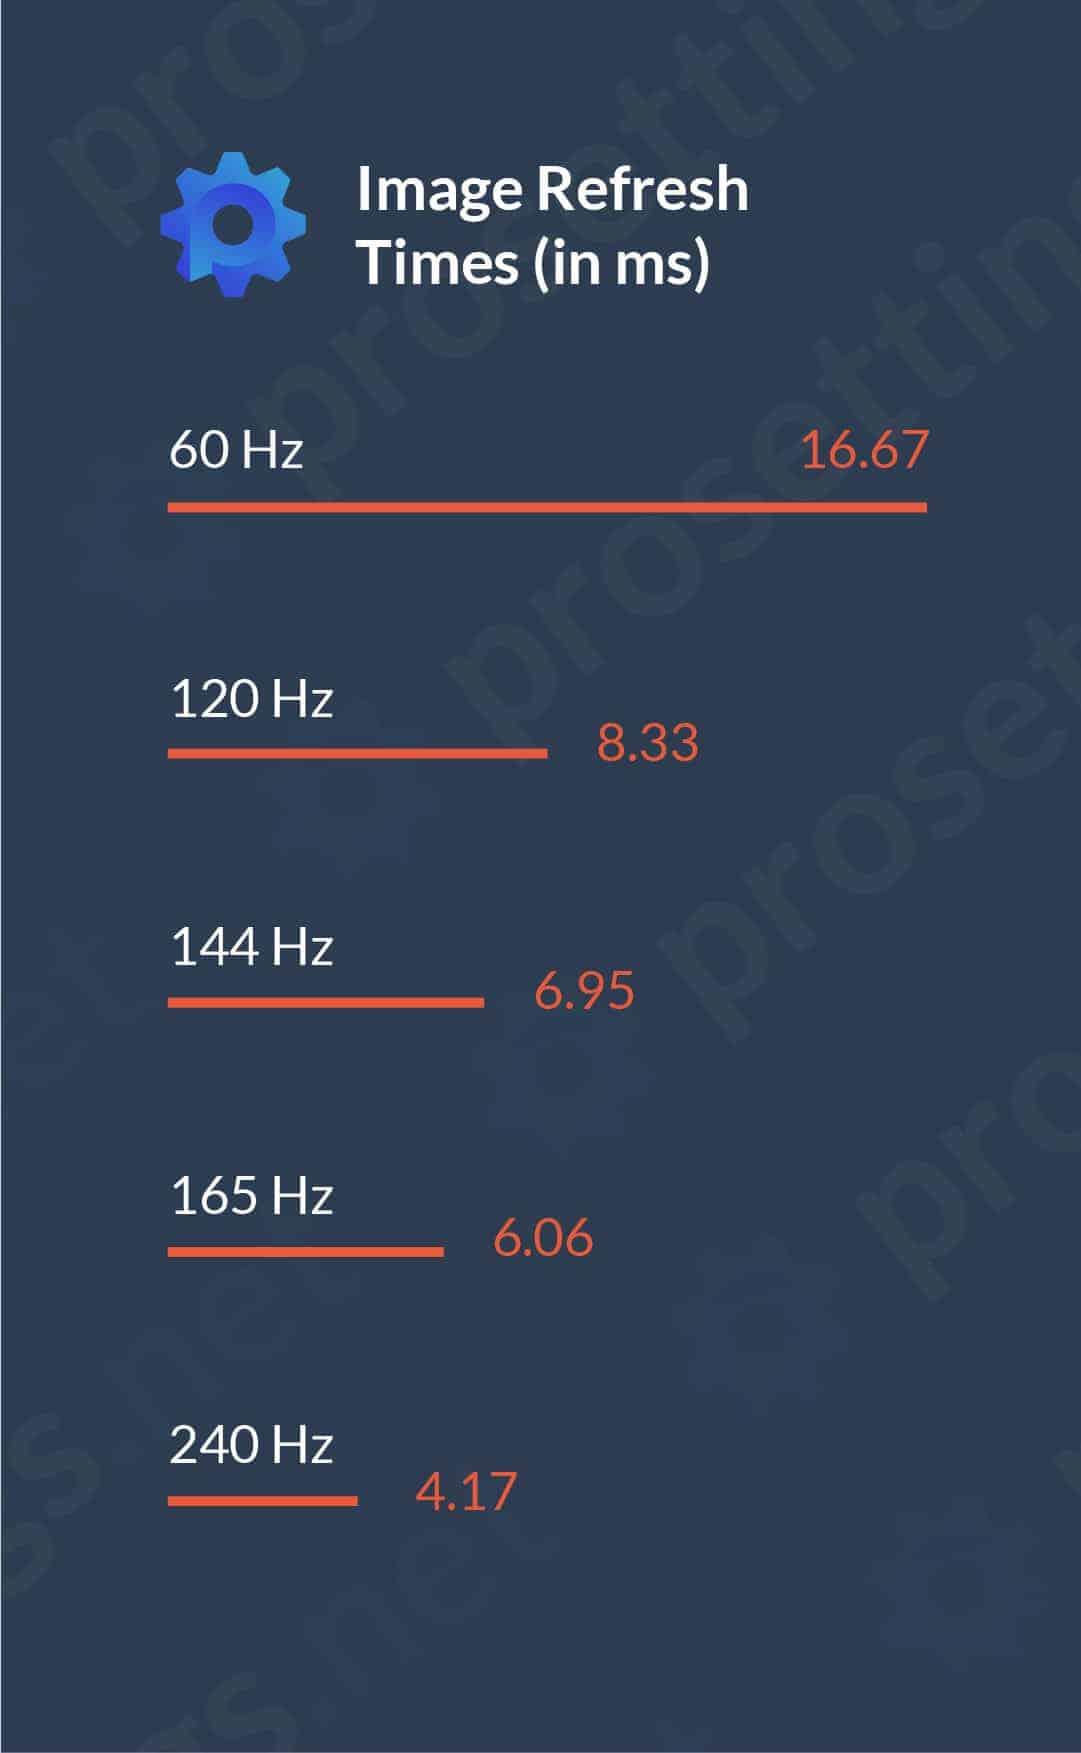 60 Hz vs. 144 Hz vs. 240 Hz